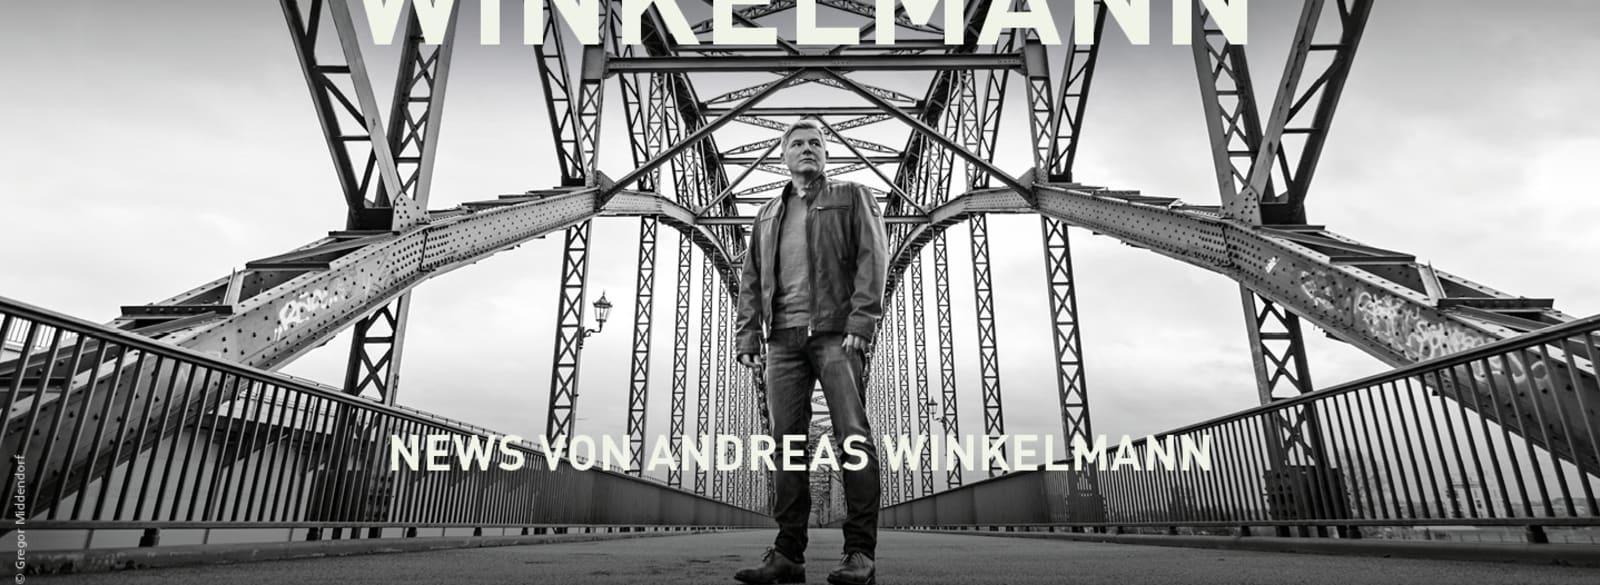 Winkelmann Newsletter